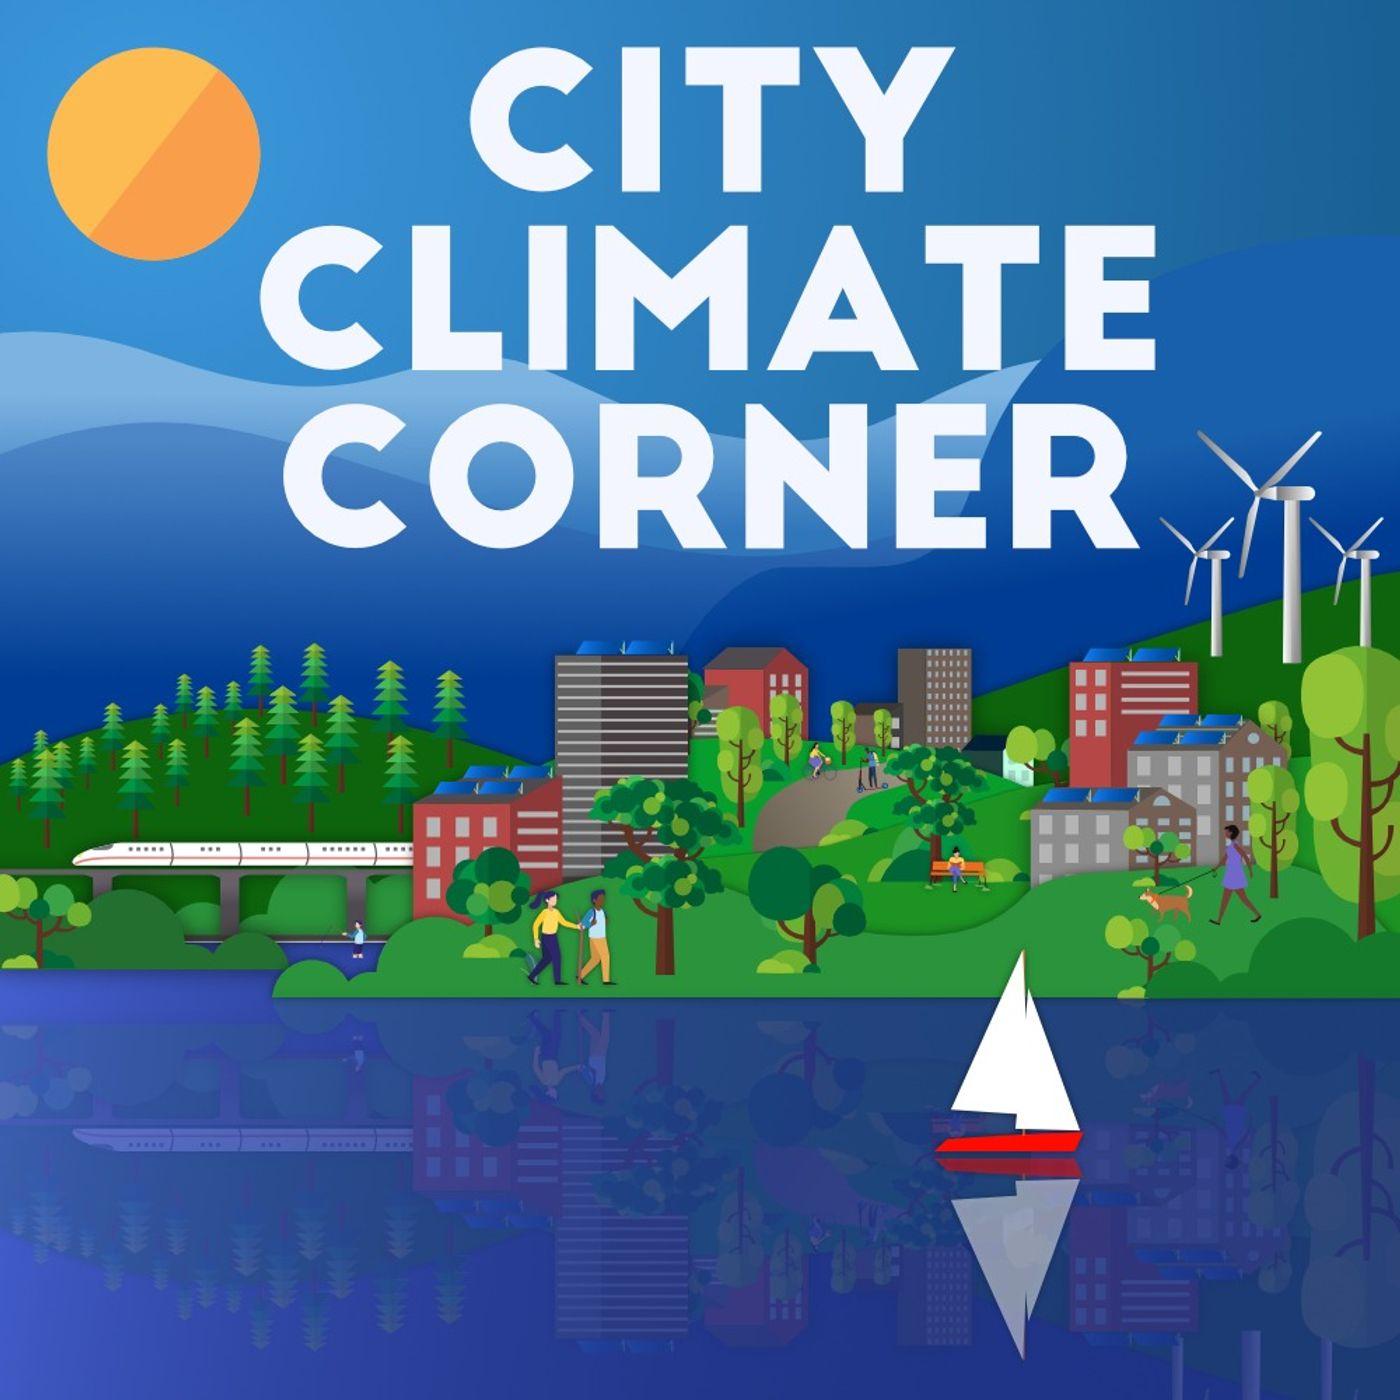 City Climate Corner